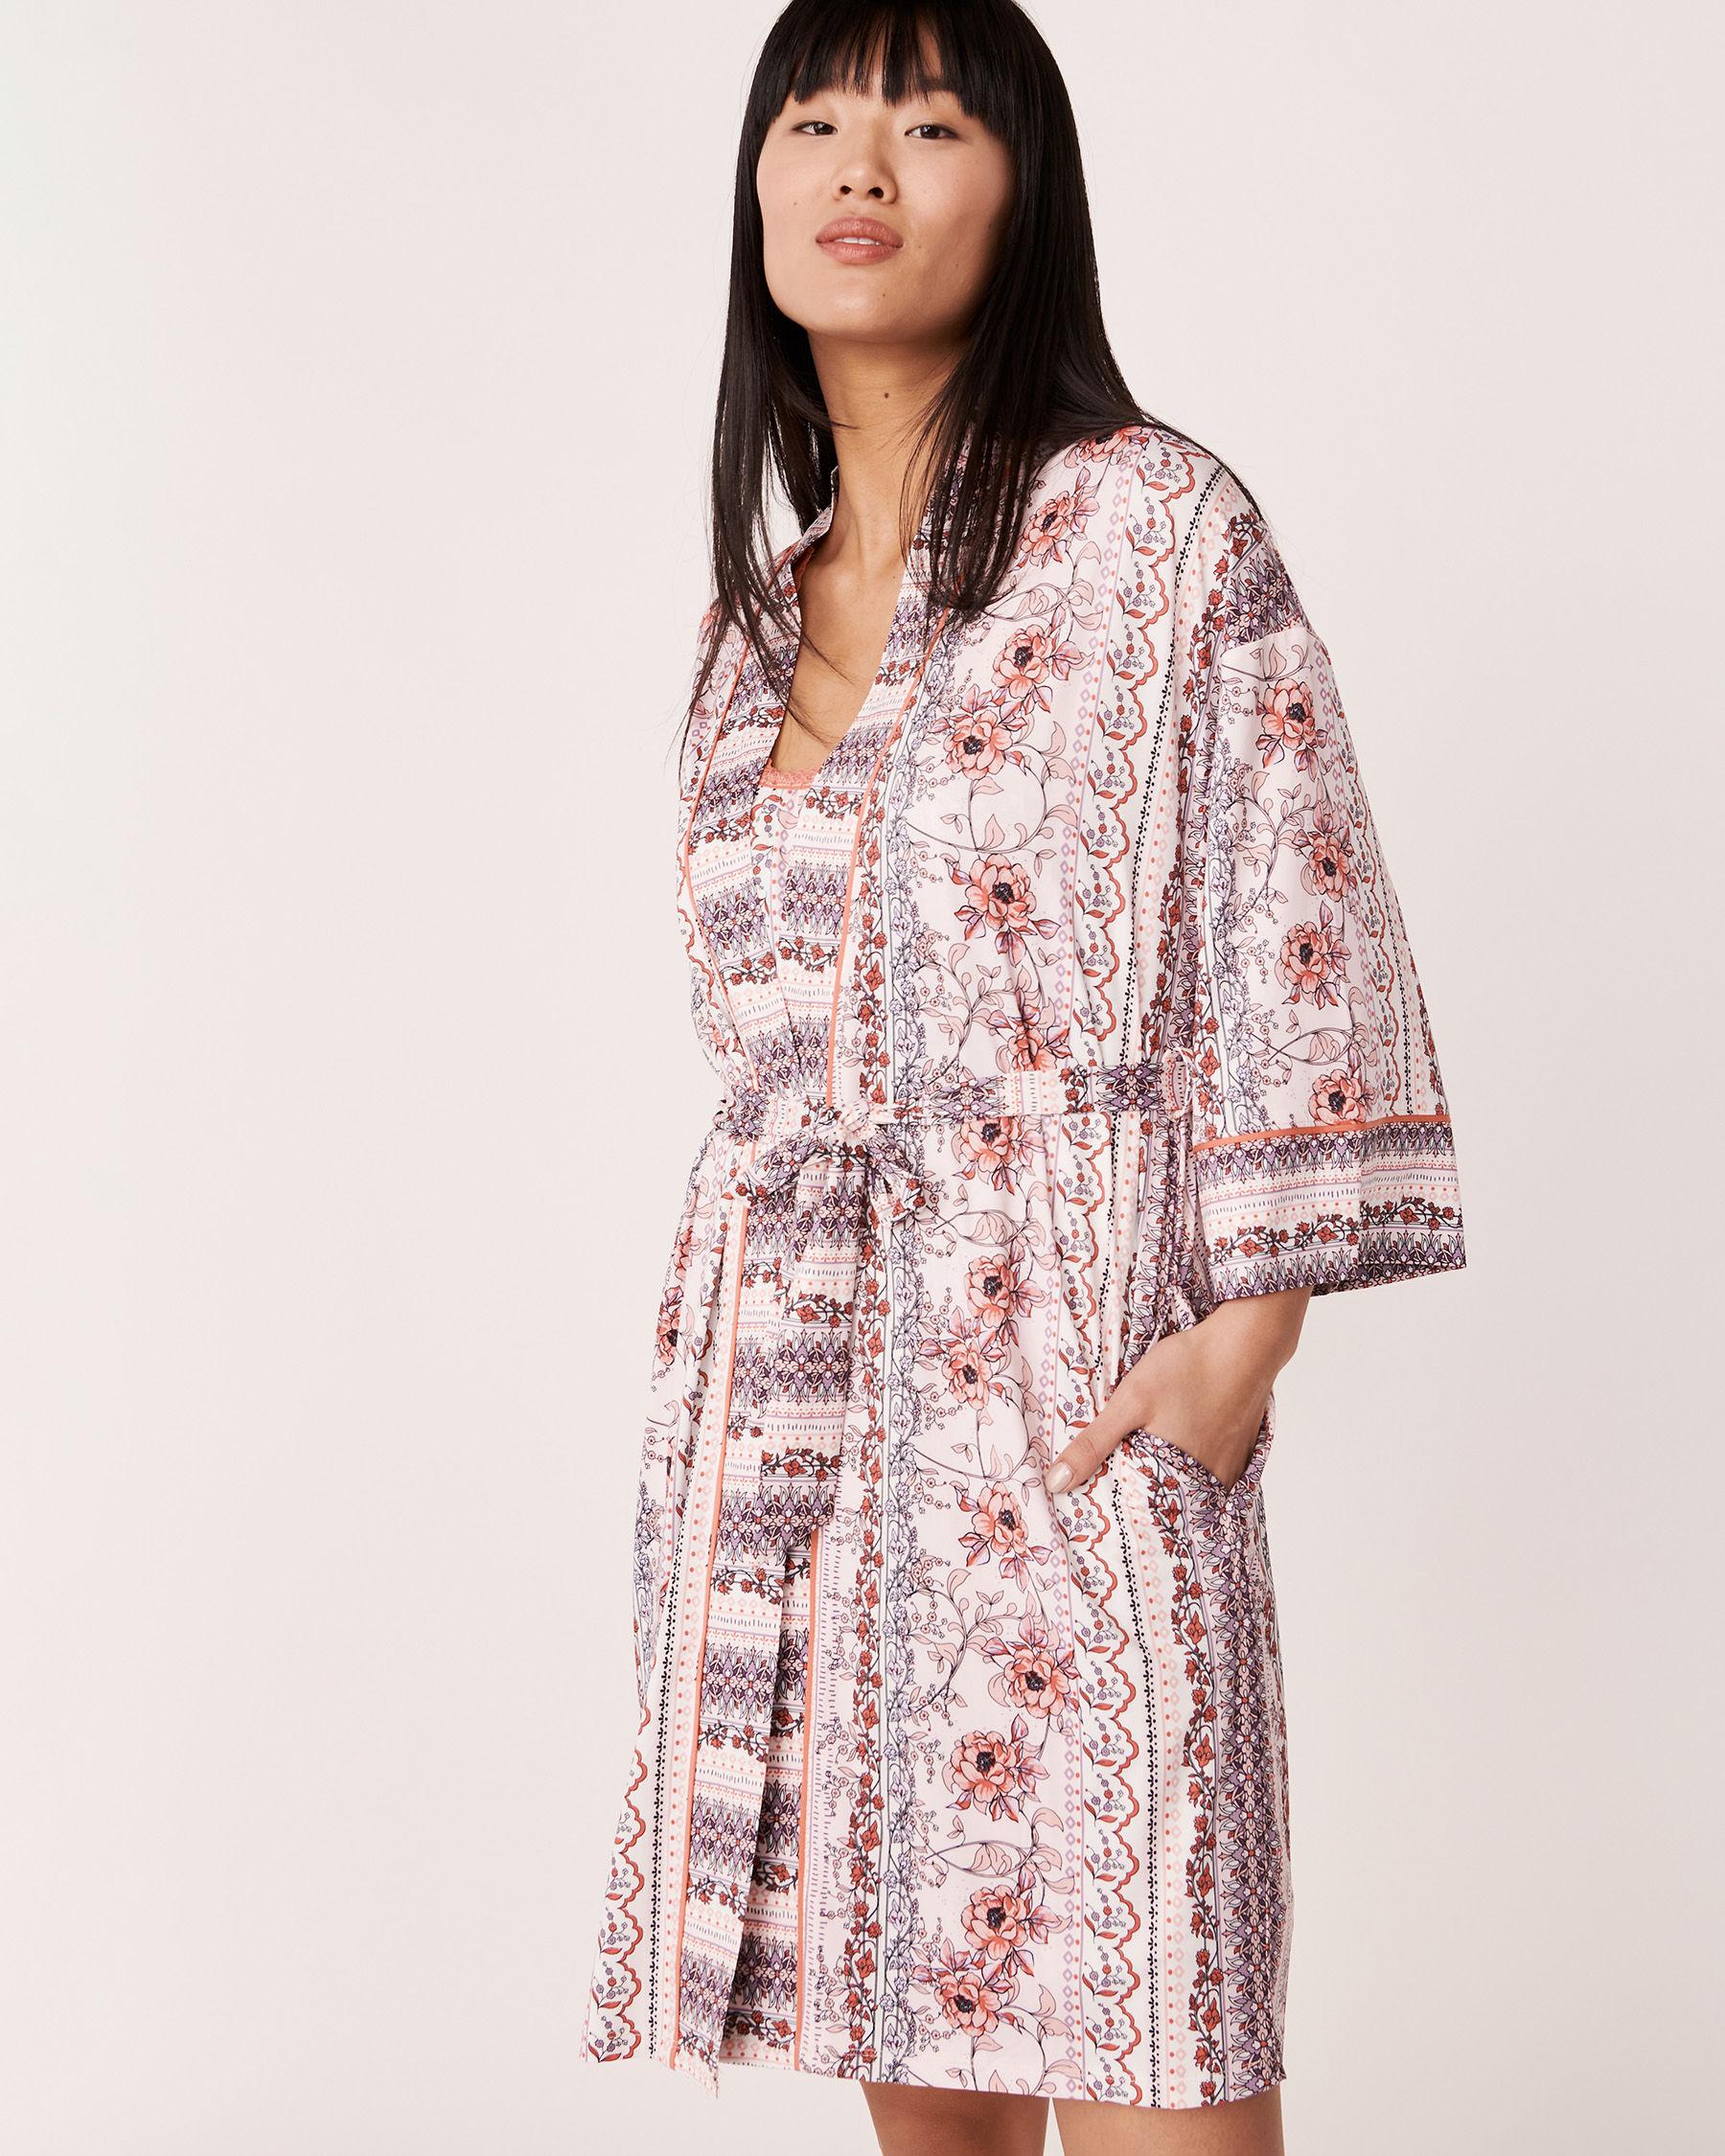 LA VIE EN ROSE Kimono en fibres recyclées Imprimé fleuri vertical 40600011 - Voir1